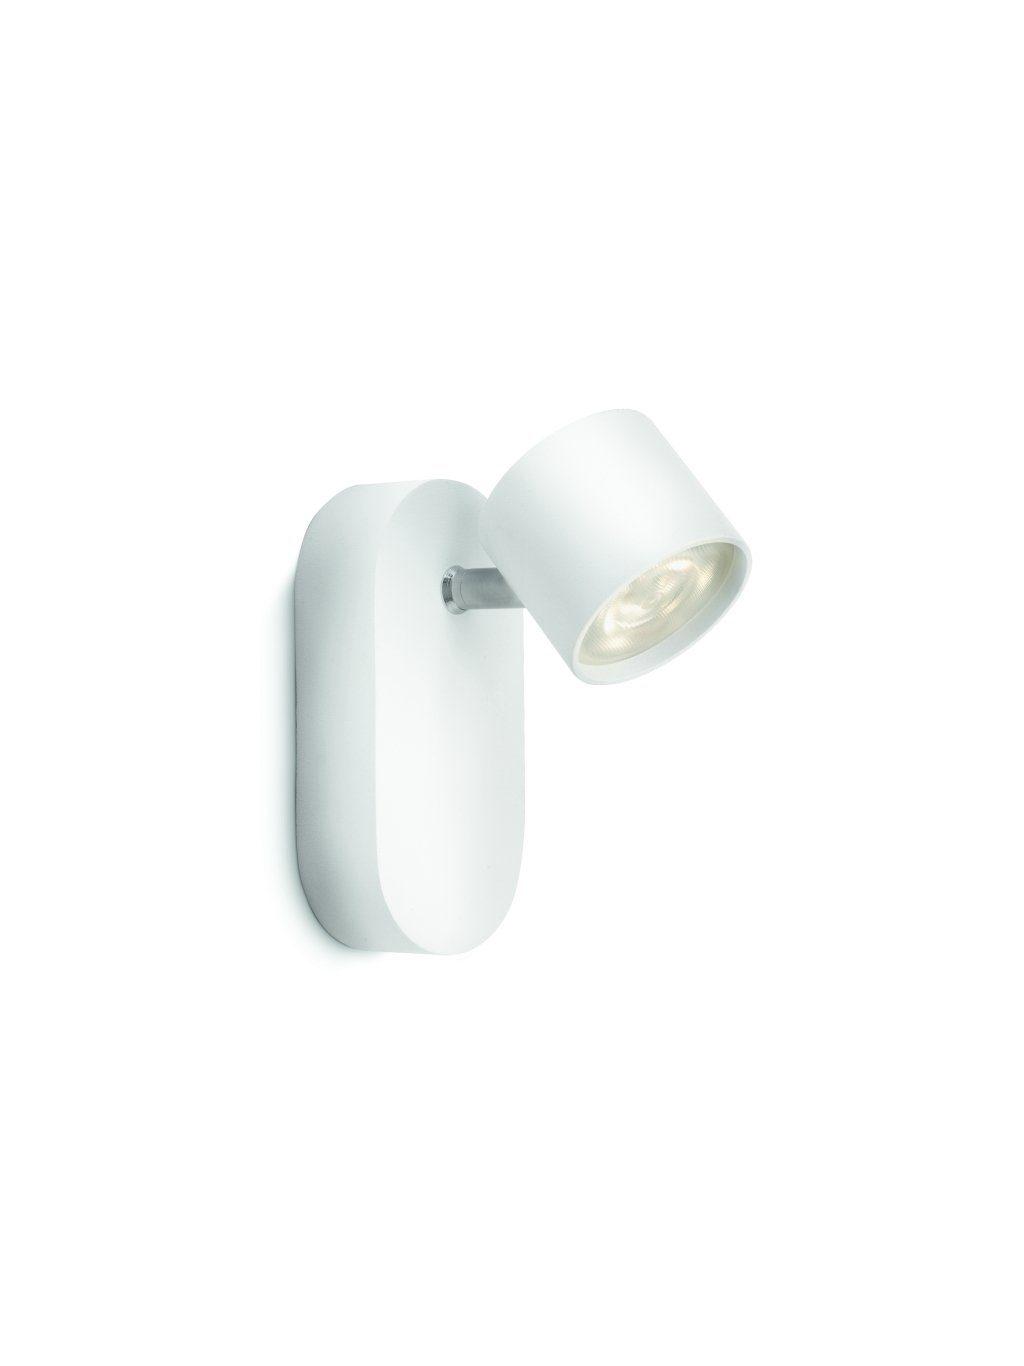 Philips Wandleuchte Star 1-flammig Weiß Spot LED - Deckenleuchten Innen